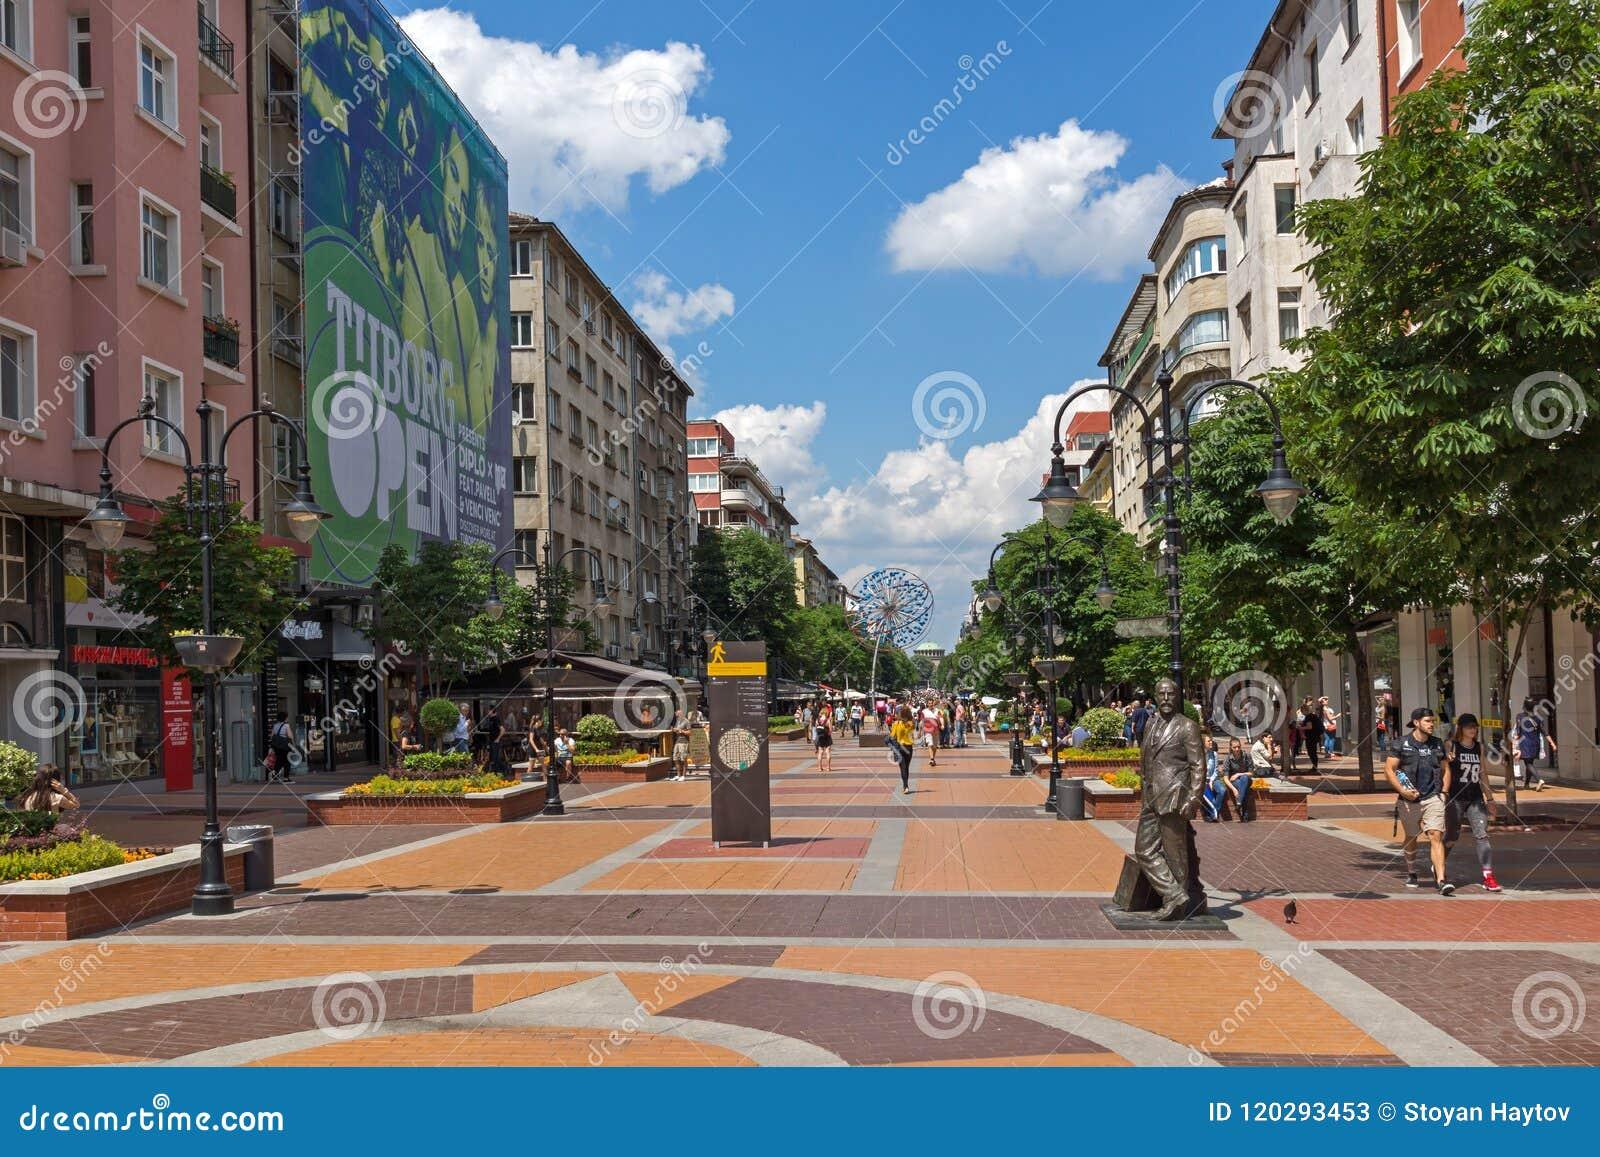 Walking people on Boulevard Vitosha in city of Sofia, Bulgaria